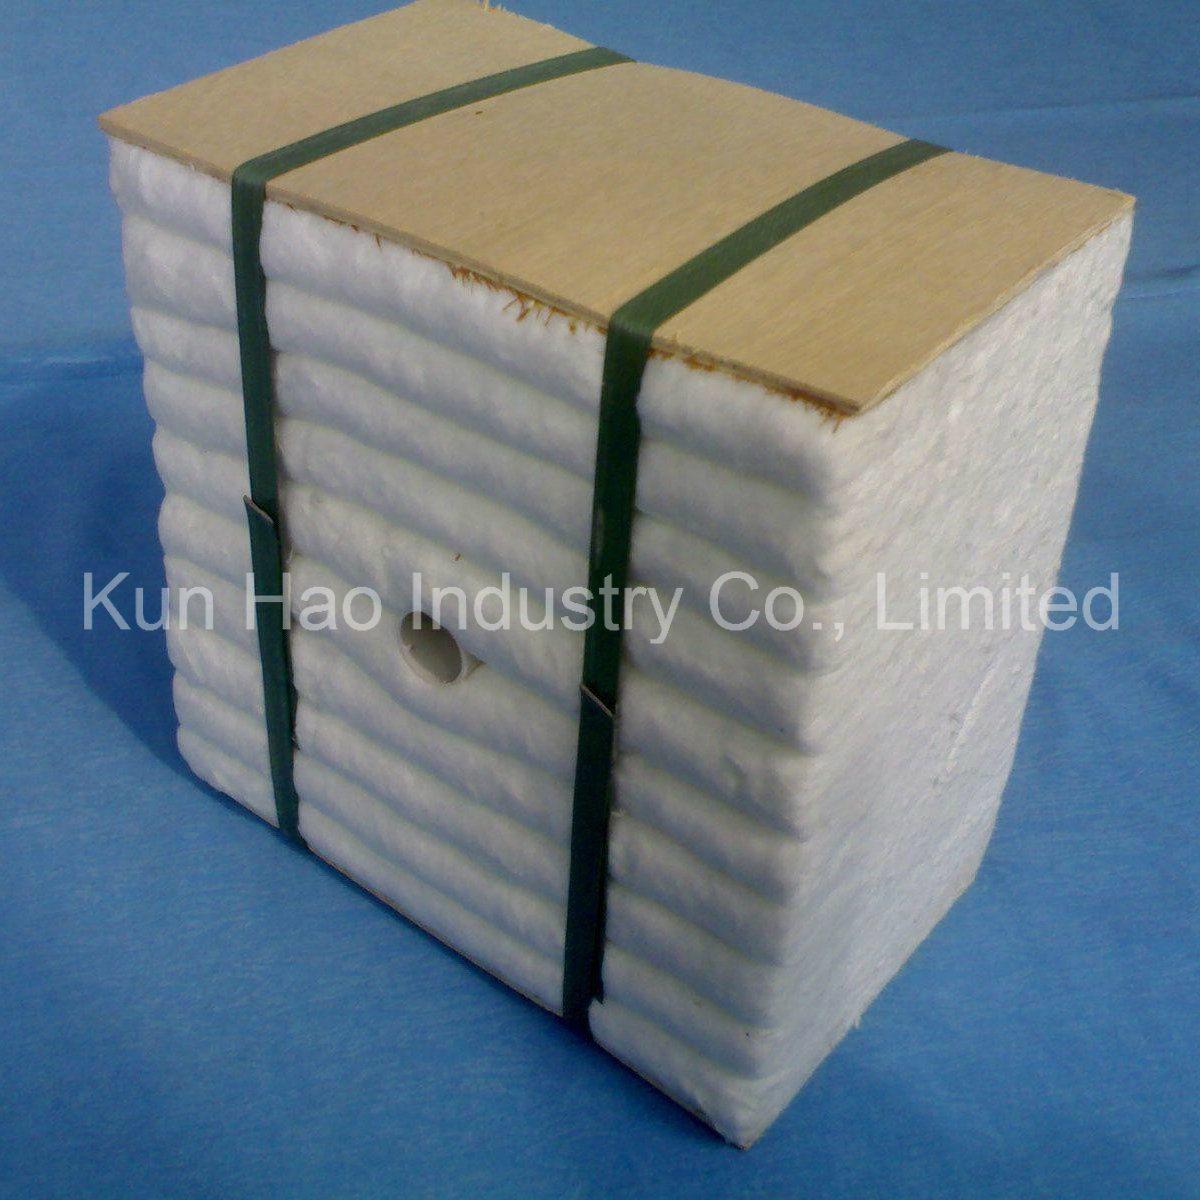 Refractory Ceramic Fiber Module for Furnace Lining